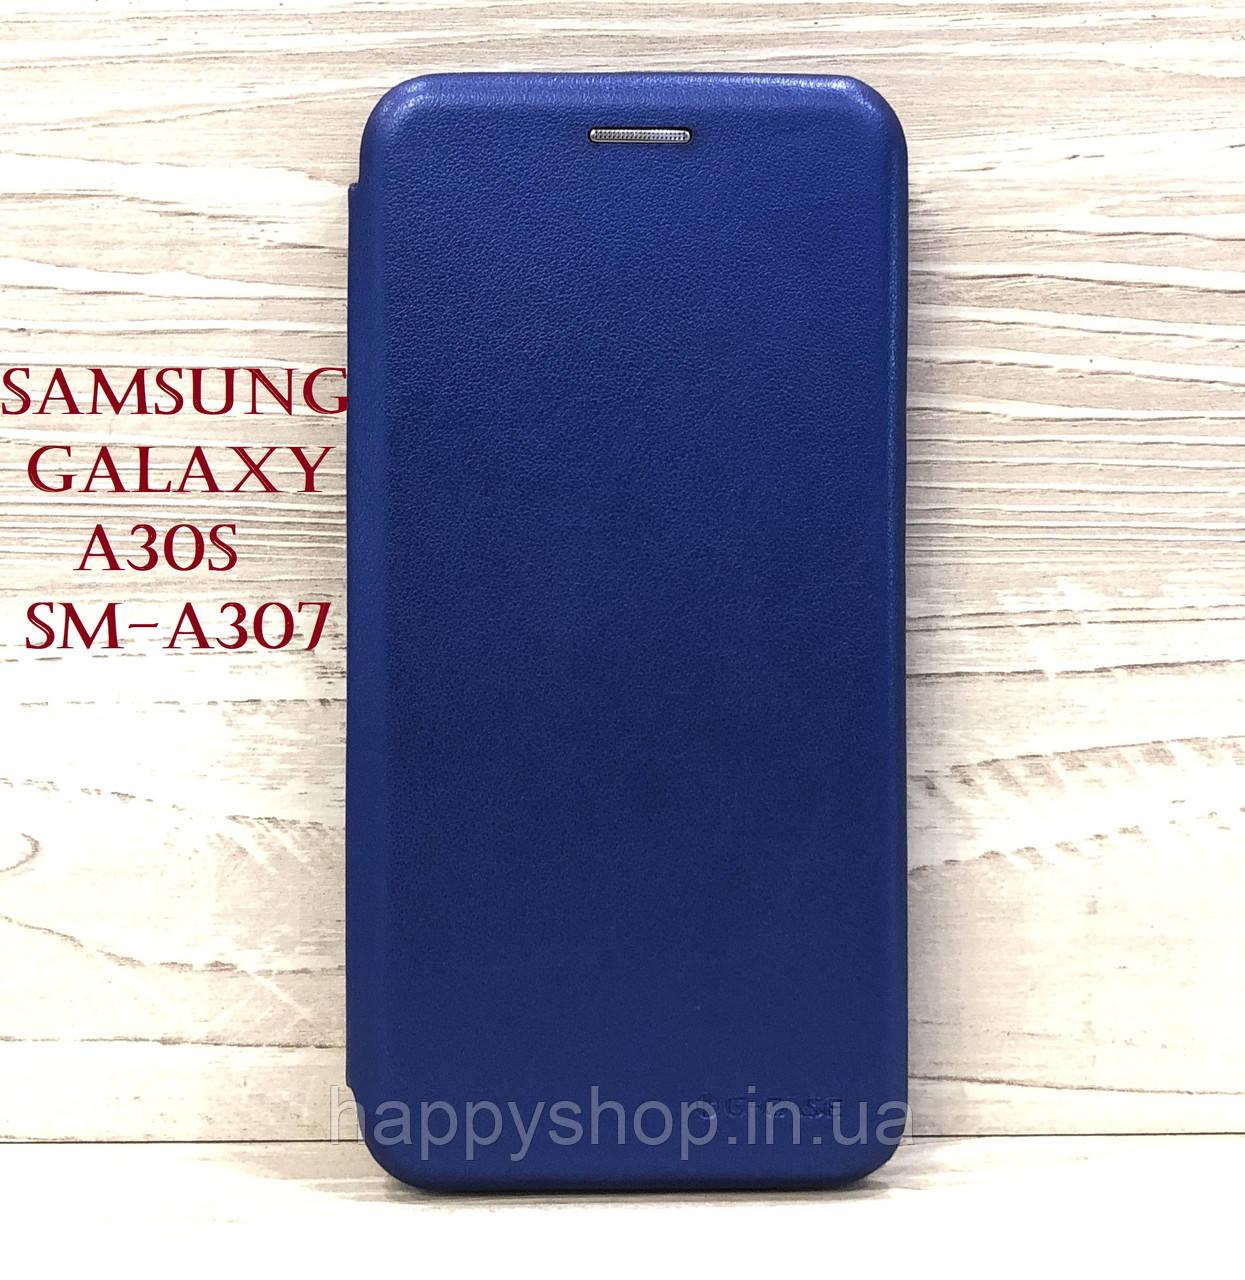 Чехол-книжка G-Case для Samsung Galaxy A30s (SM-A307) Синий